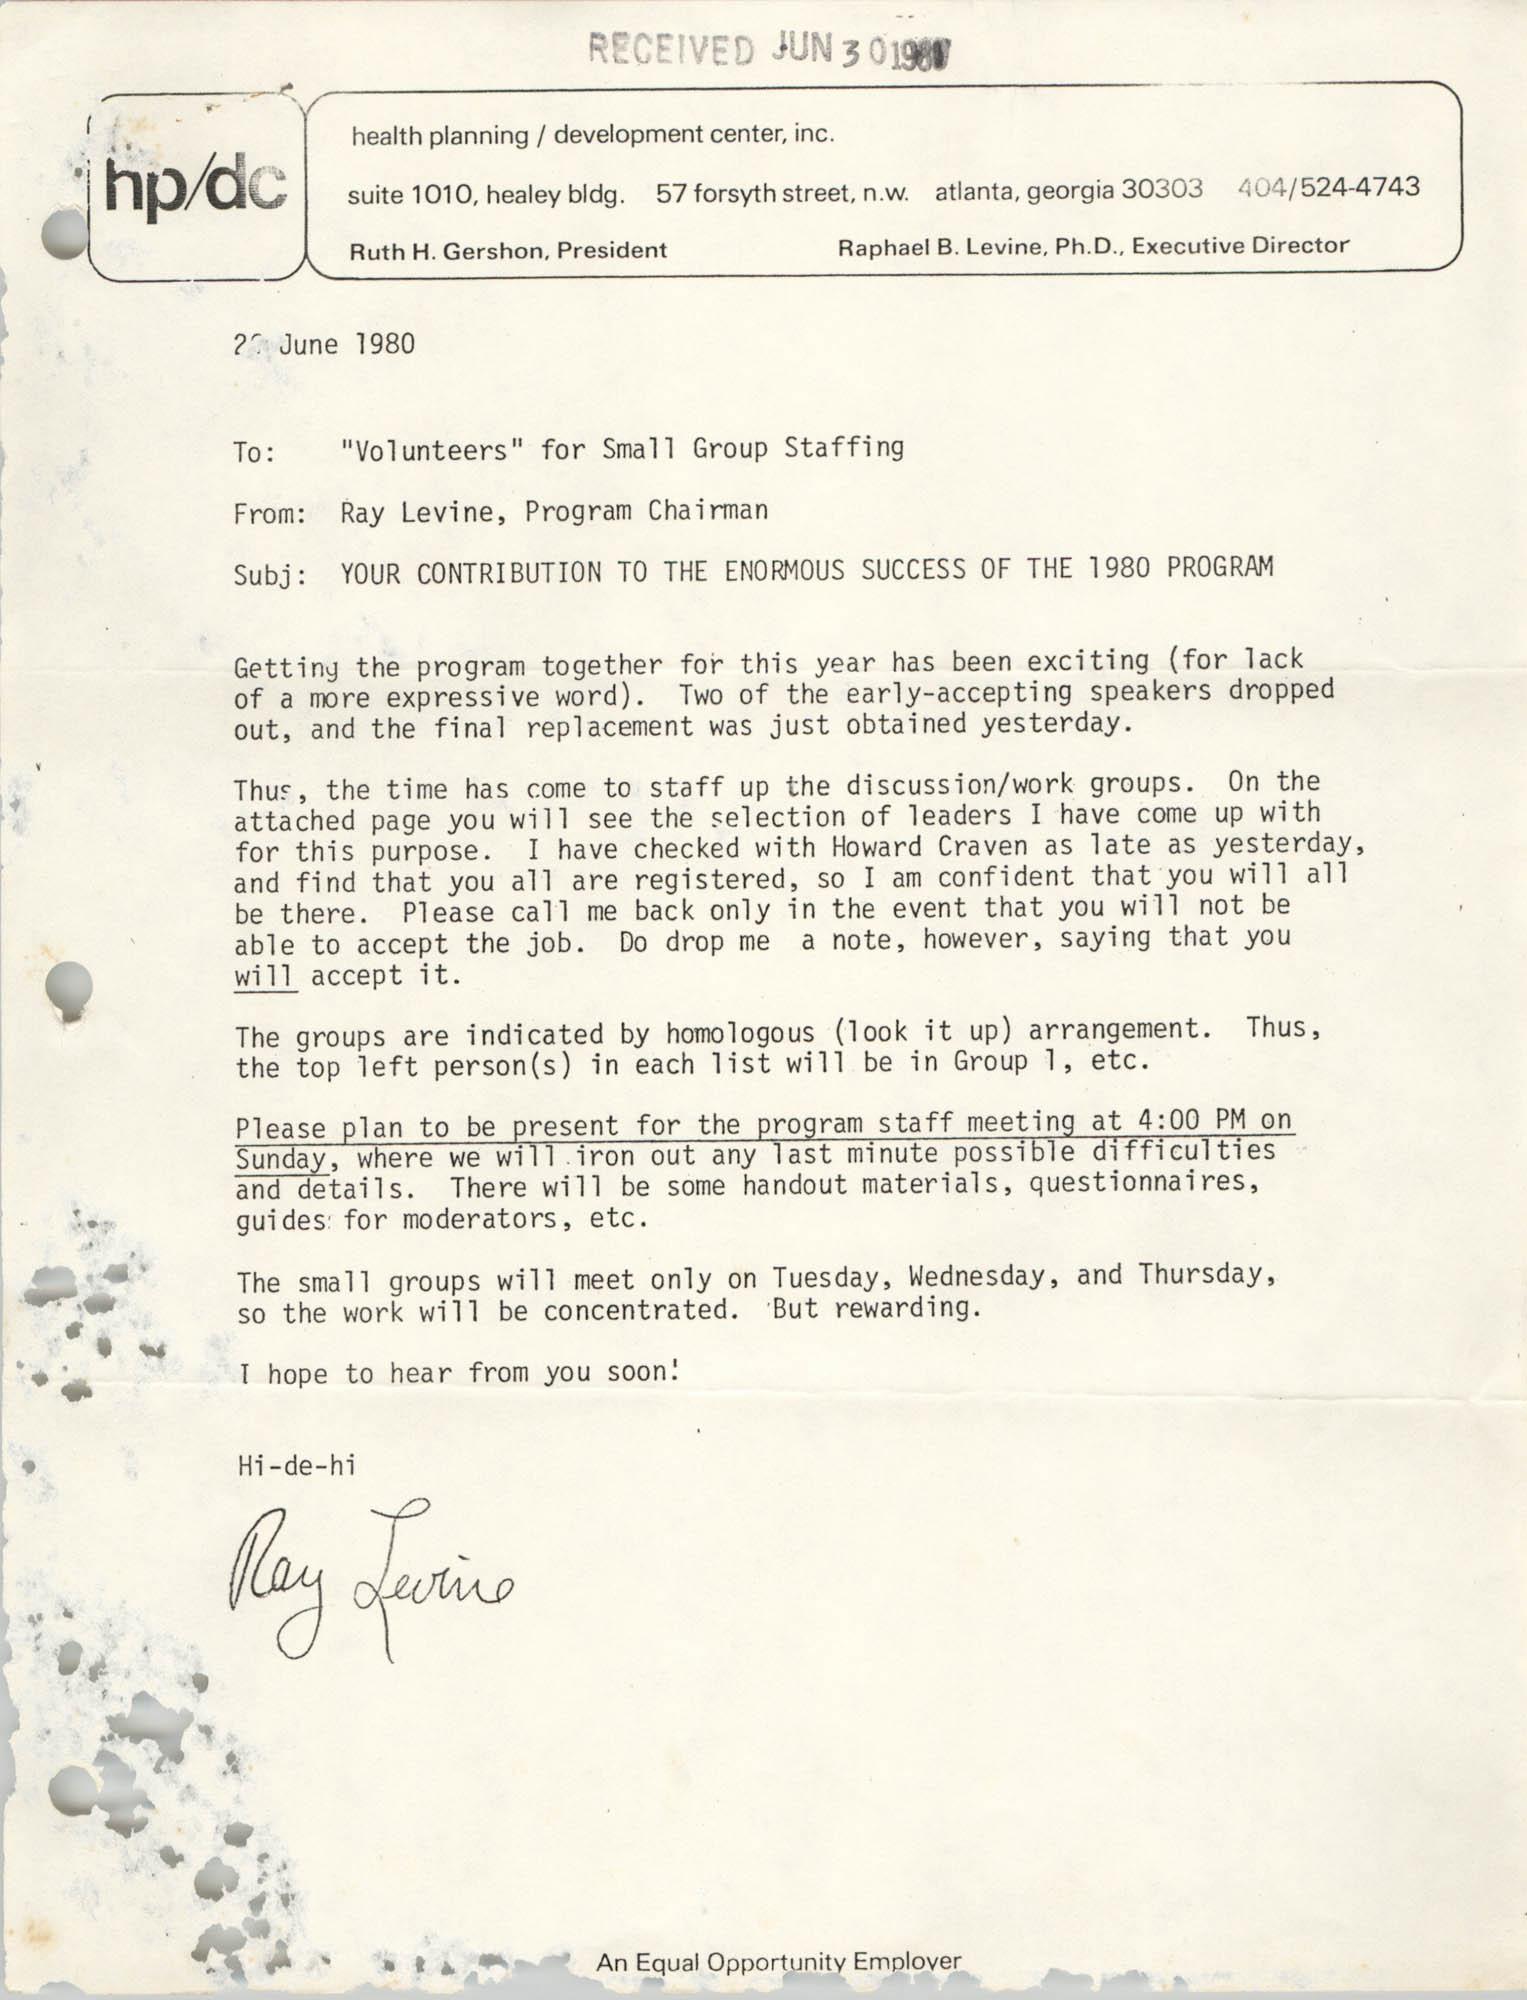 Health Planning/Development Center, Inc. Memorandum, June 1980